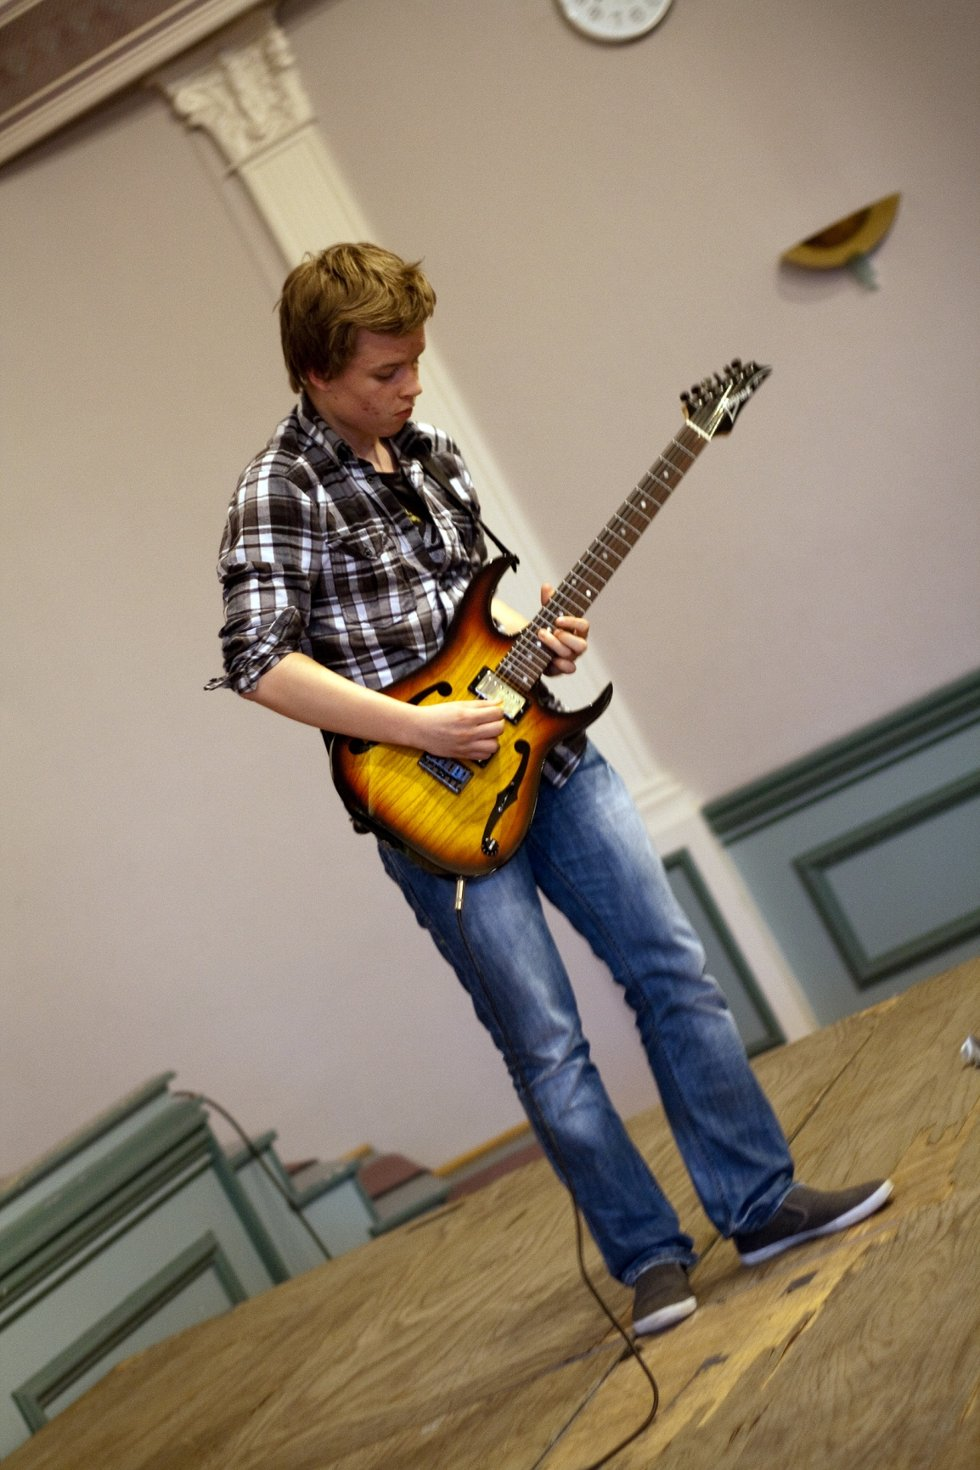 Gitarist Ingvald Minge (17) spilte el-gitar. han er fra Trøgstad